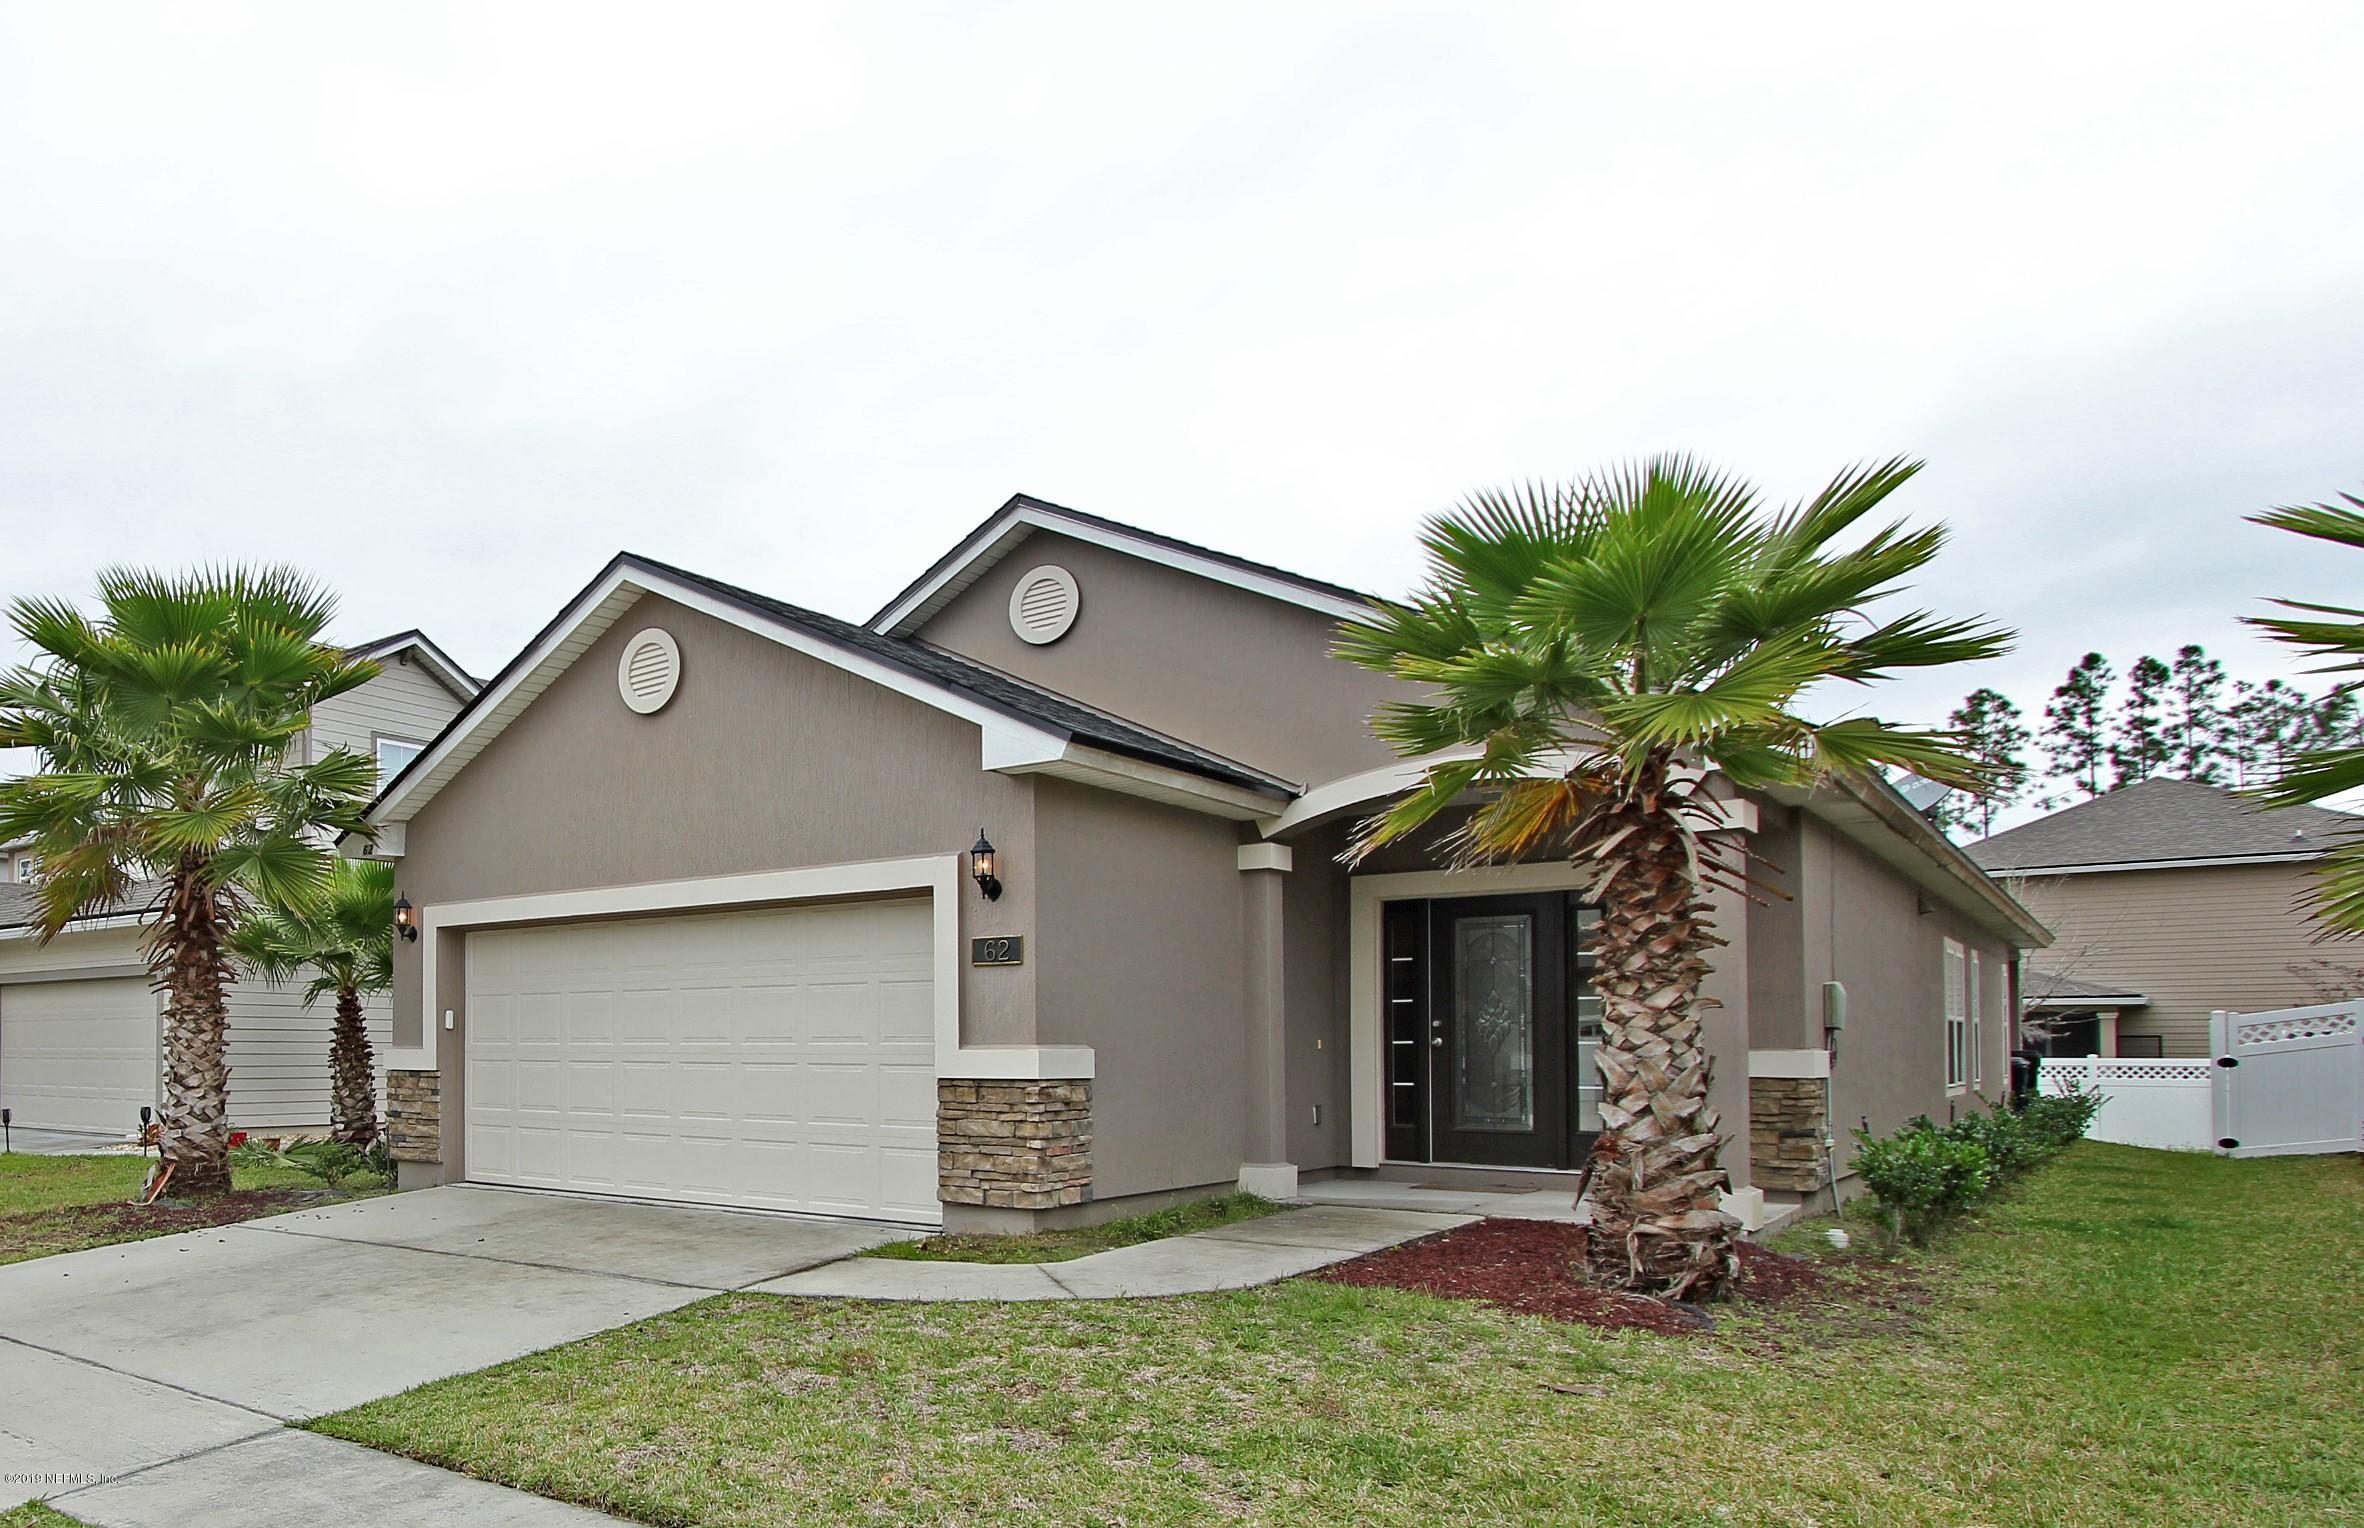 62 FERNBROOK, ST JOHNS, FLORIDA 32259, 3 Bedrooms Bedrooms, ,2 BathroomsBathrooms,Residential - single family,For sale,FERNBROOK,983754